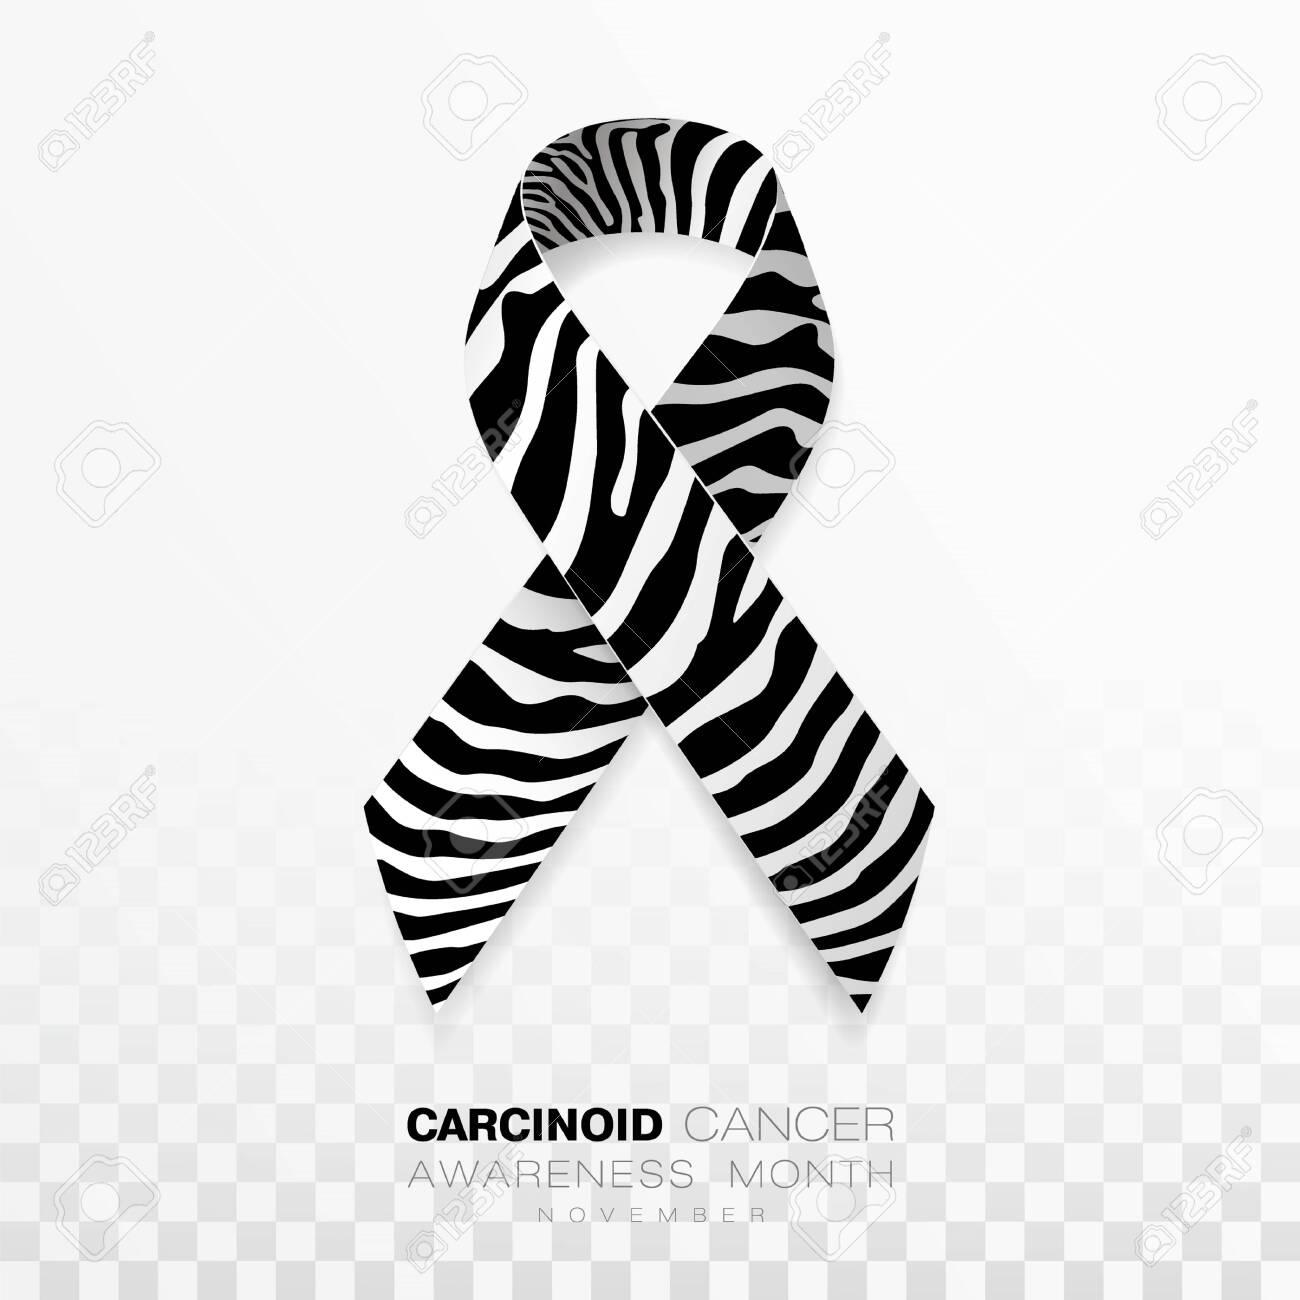 neuroendocrine cancer awareness month)